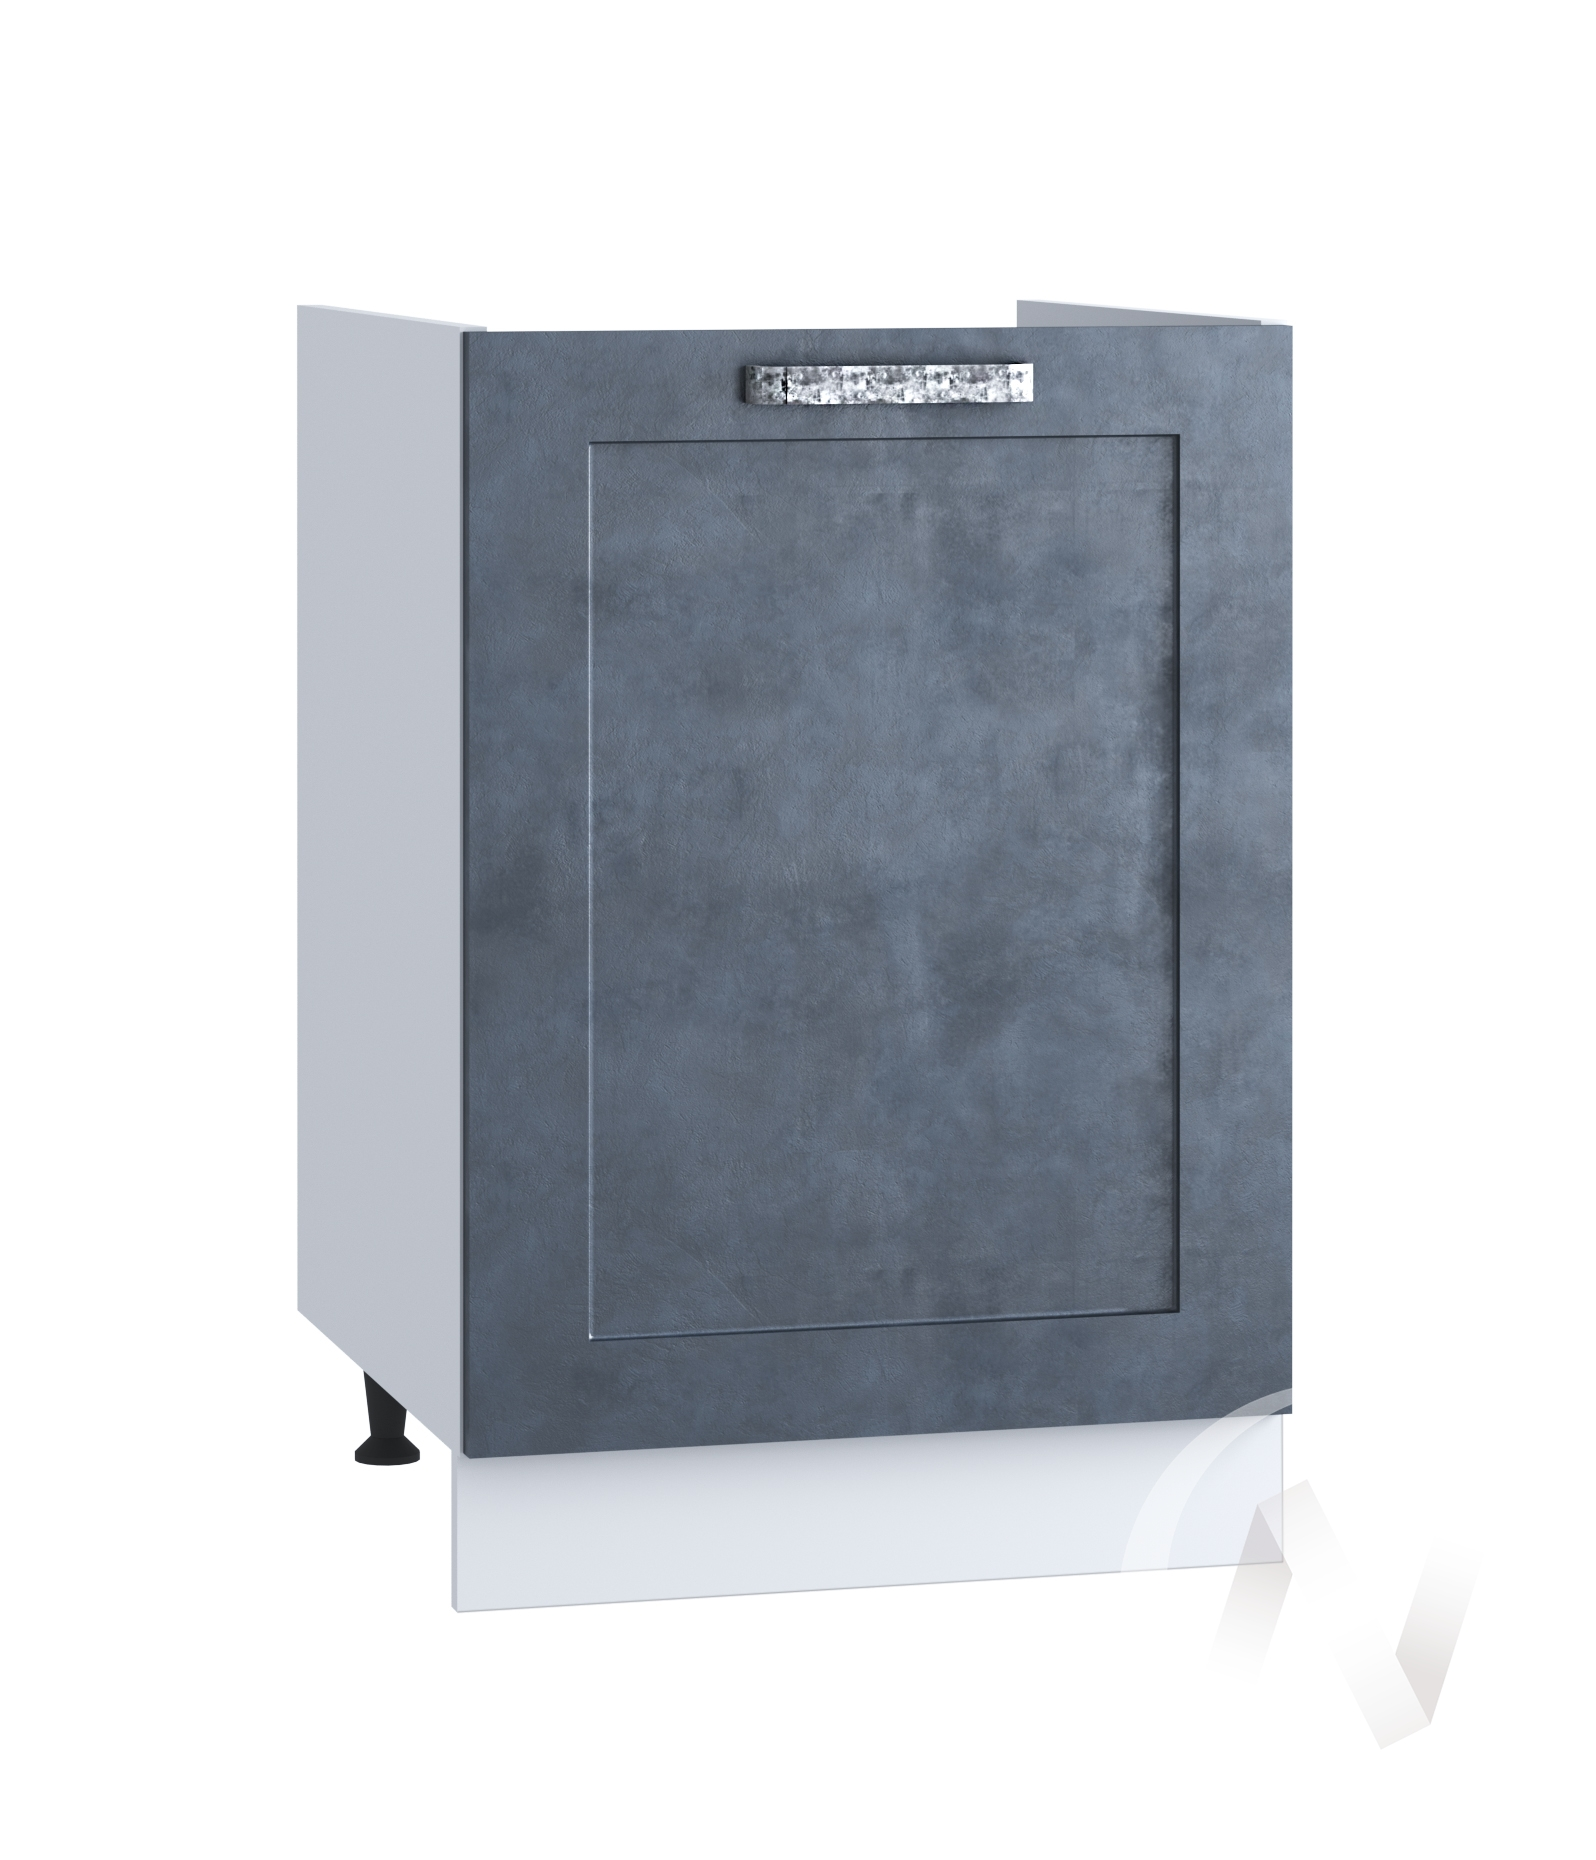 "Кухня ""Лофт"": Шкаф нижний под мойку 500, ШНМ 500 (Бетон графит/корпус белый)"